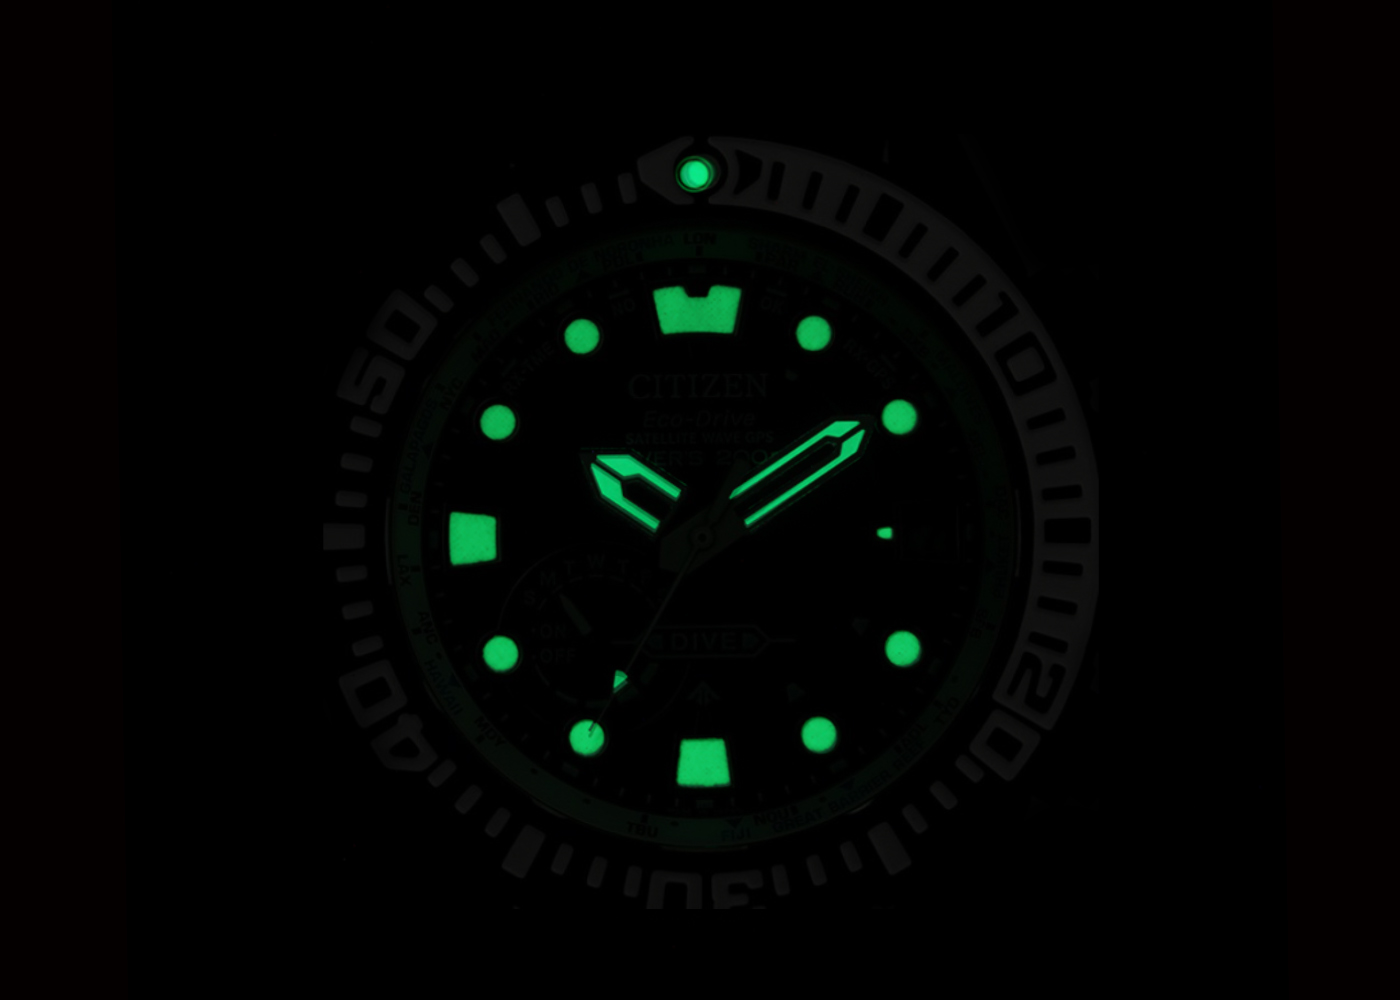 Detalle luminova Citizen promaster modelo cc5006-06l